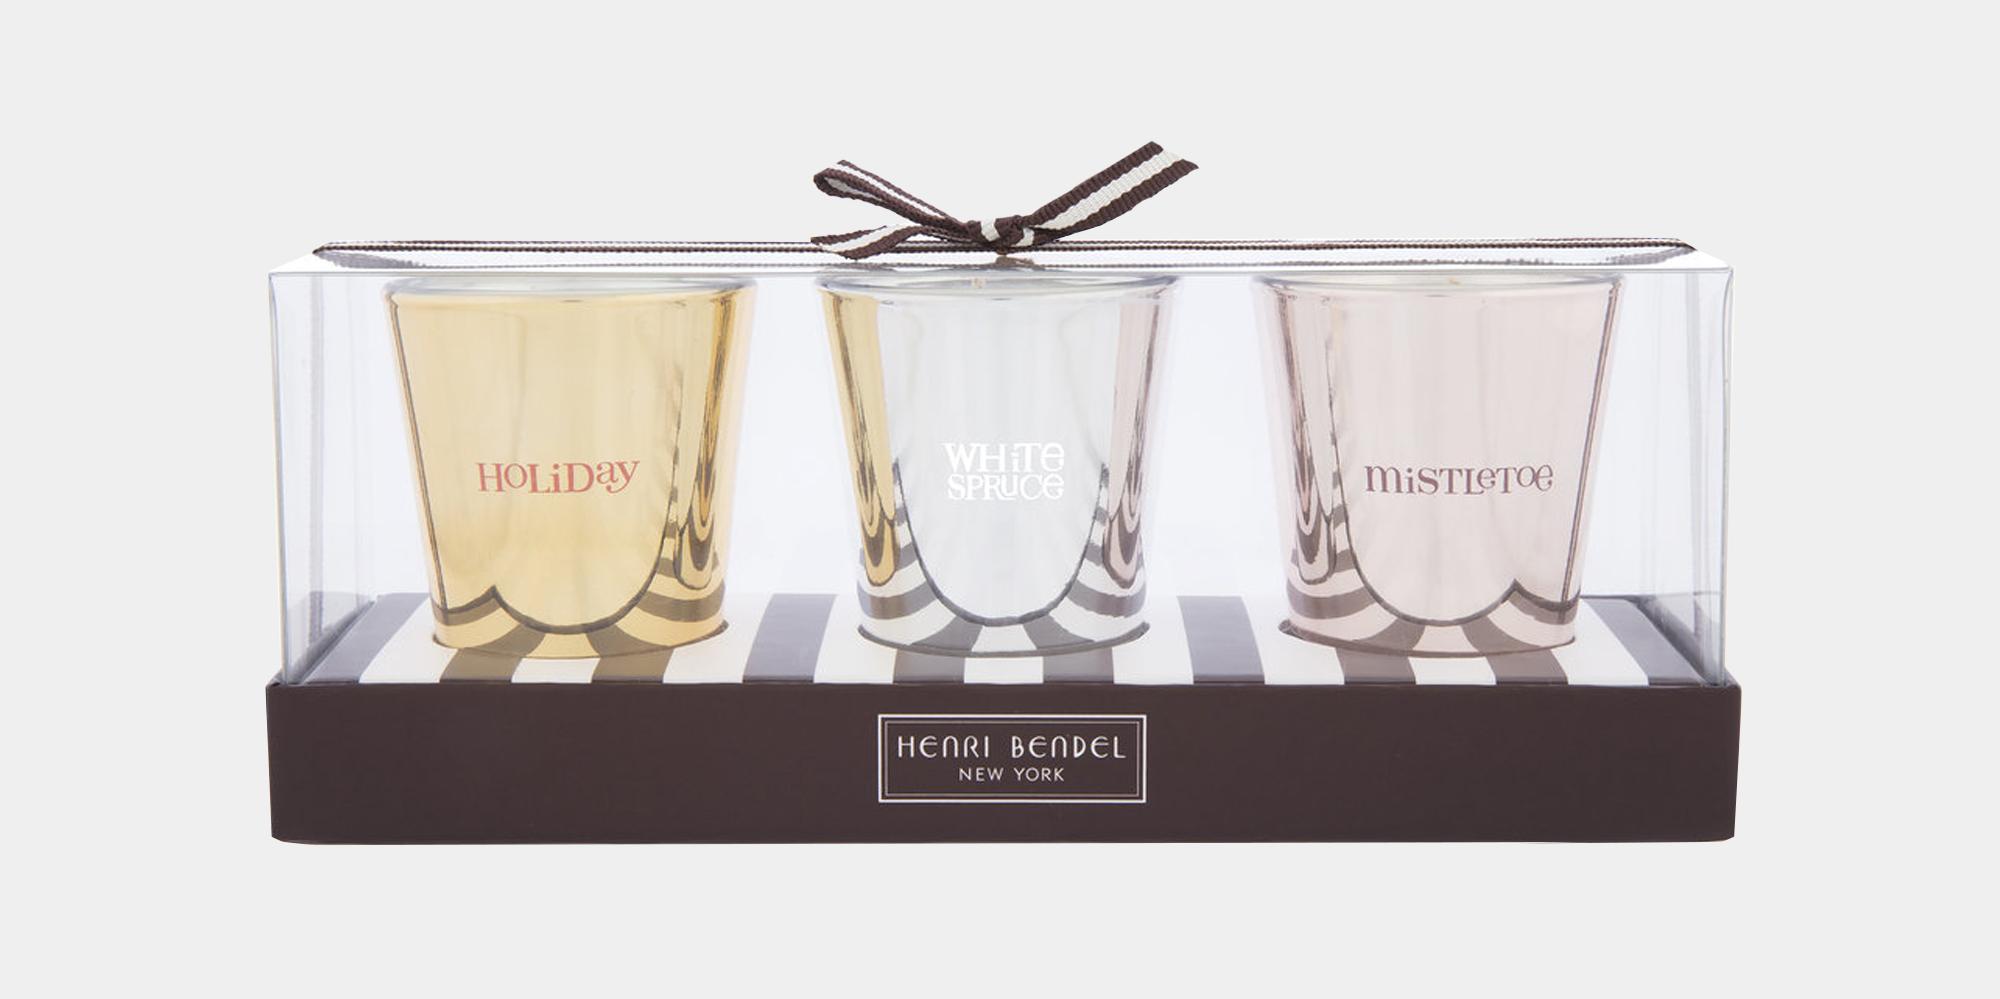 henri-bendel-candles-holiday-gift-guide-bro-bear-blog.jpg